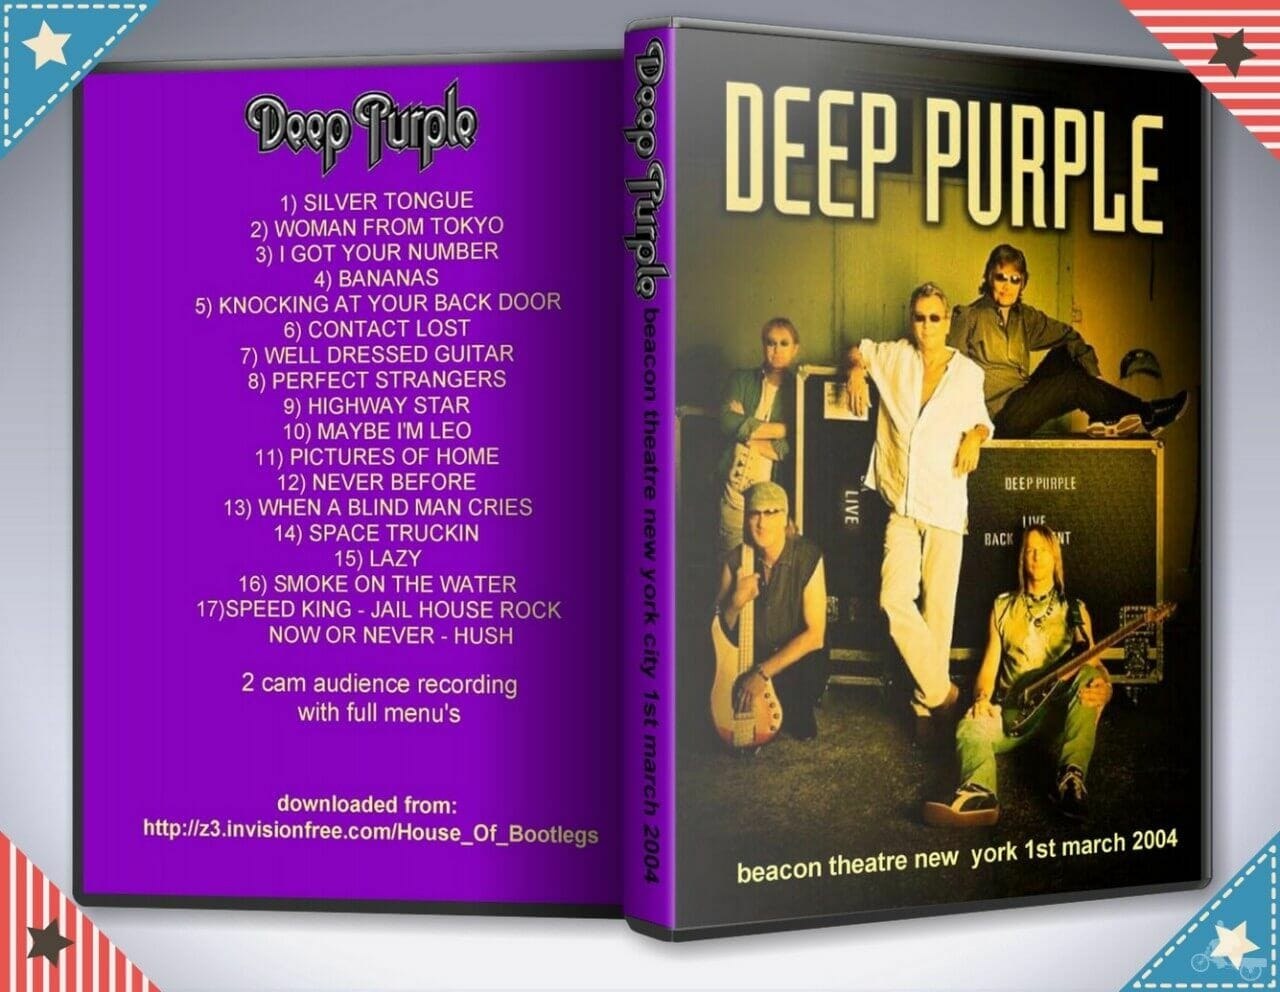 beacon theatre new york deep purple 2004